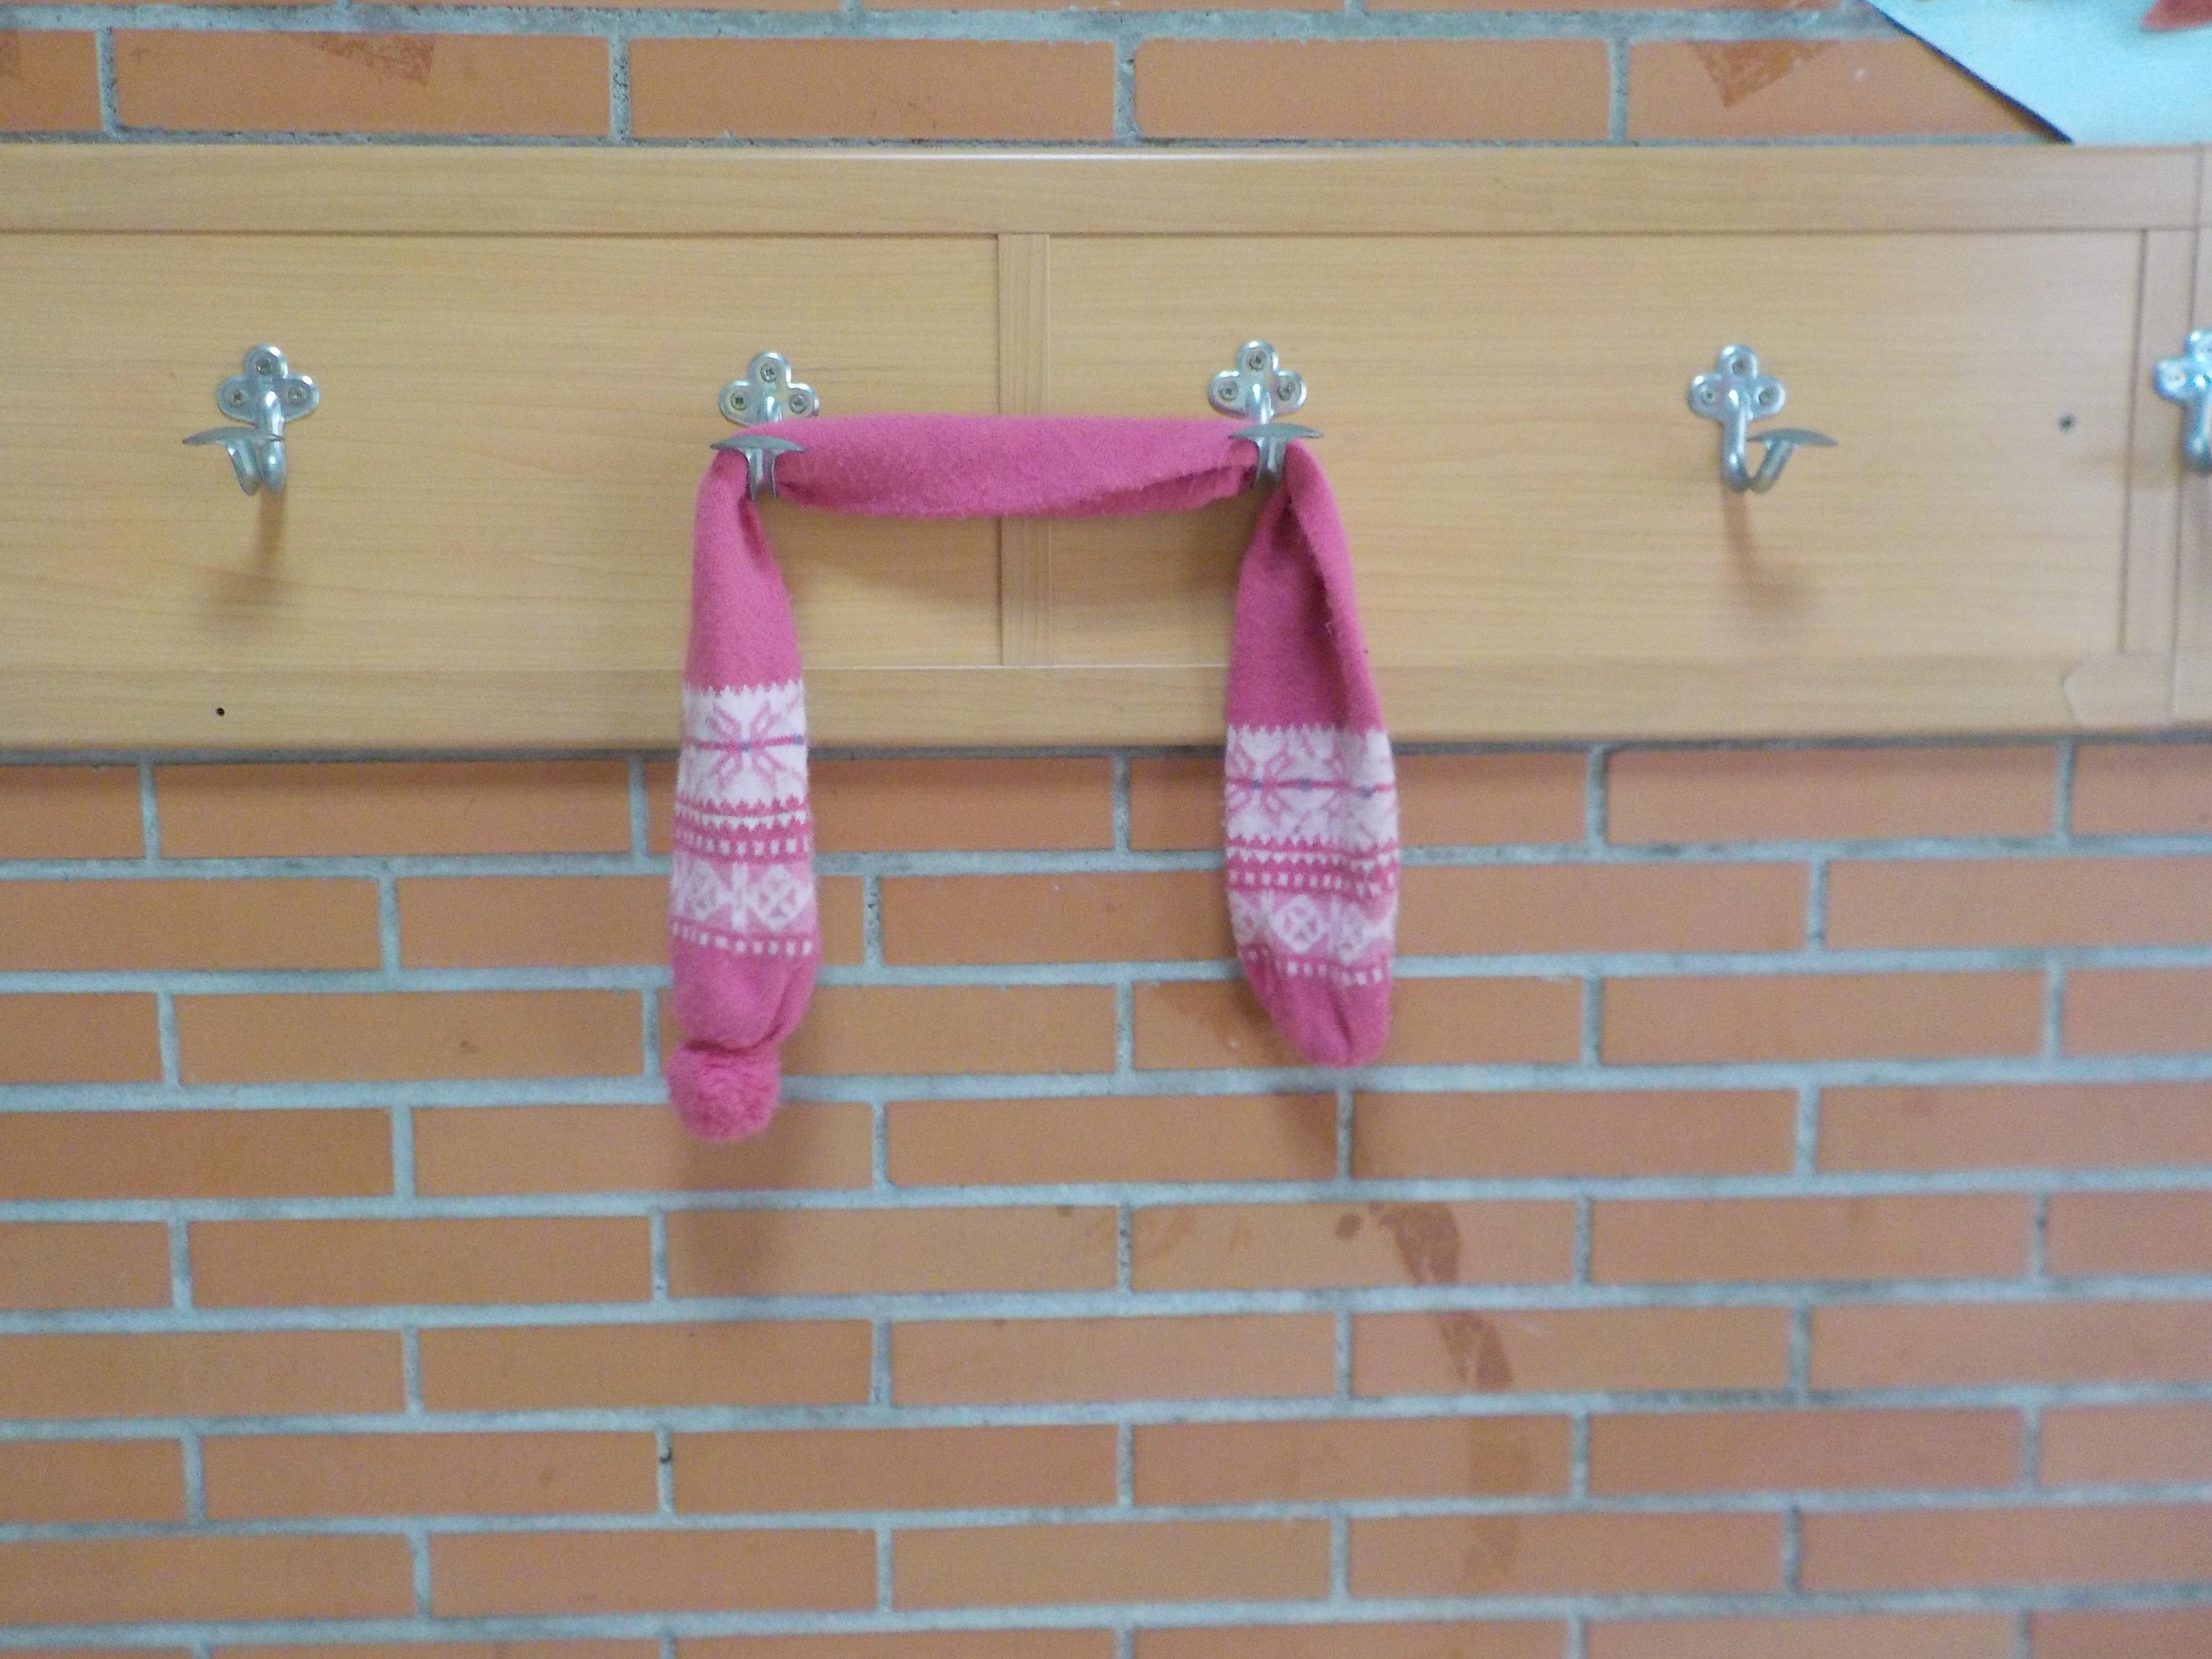 Catalogo de ropa olvidada 2  2018 26